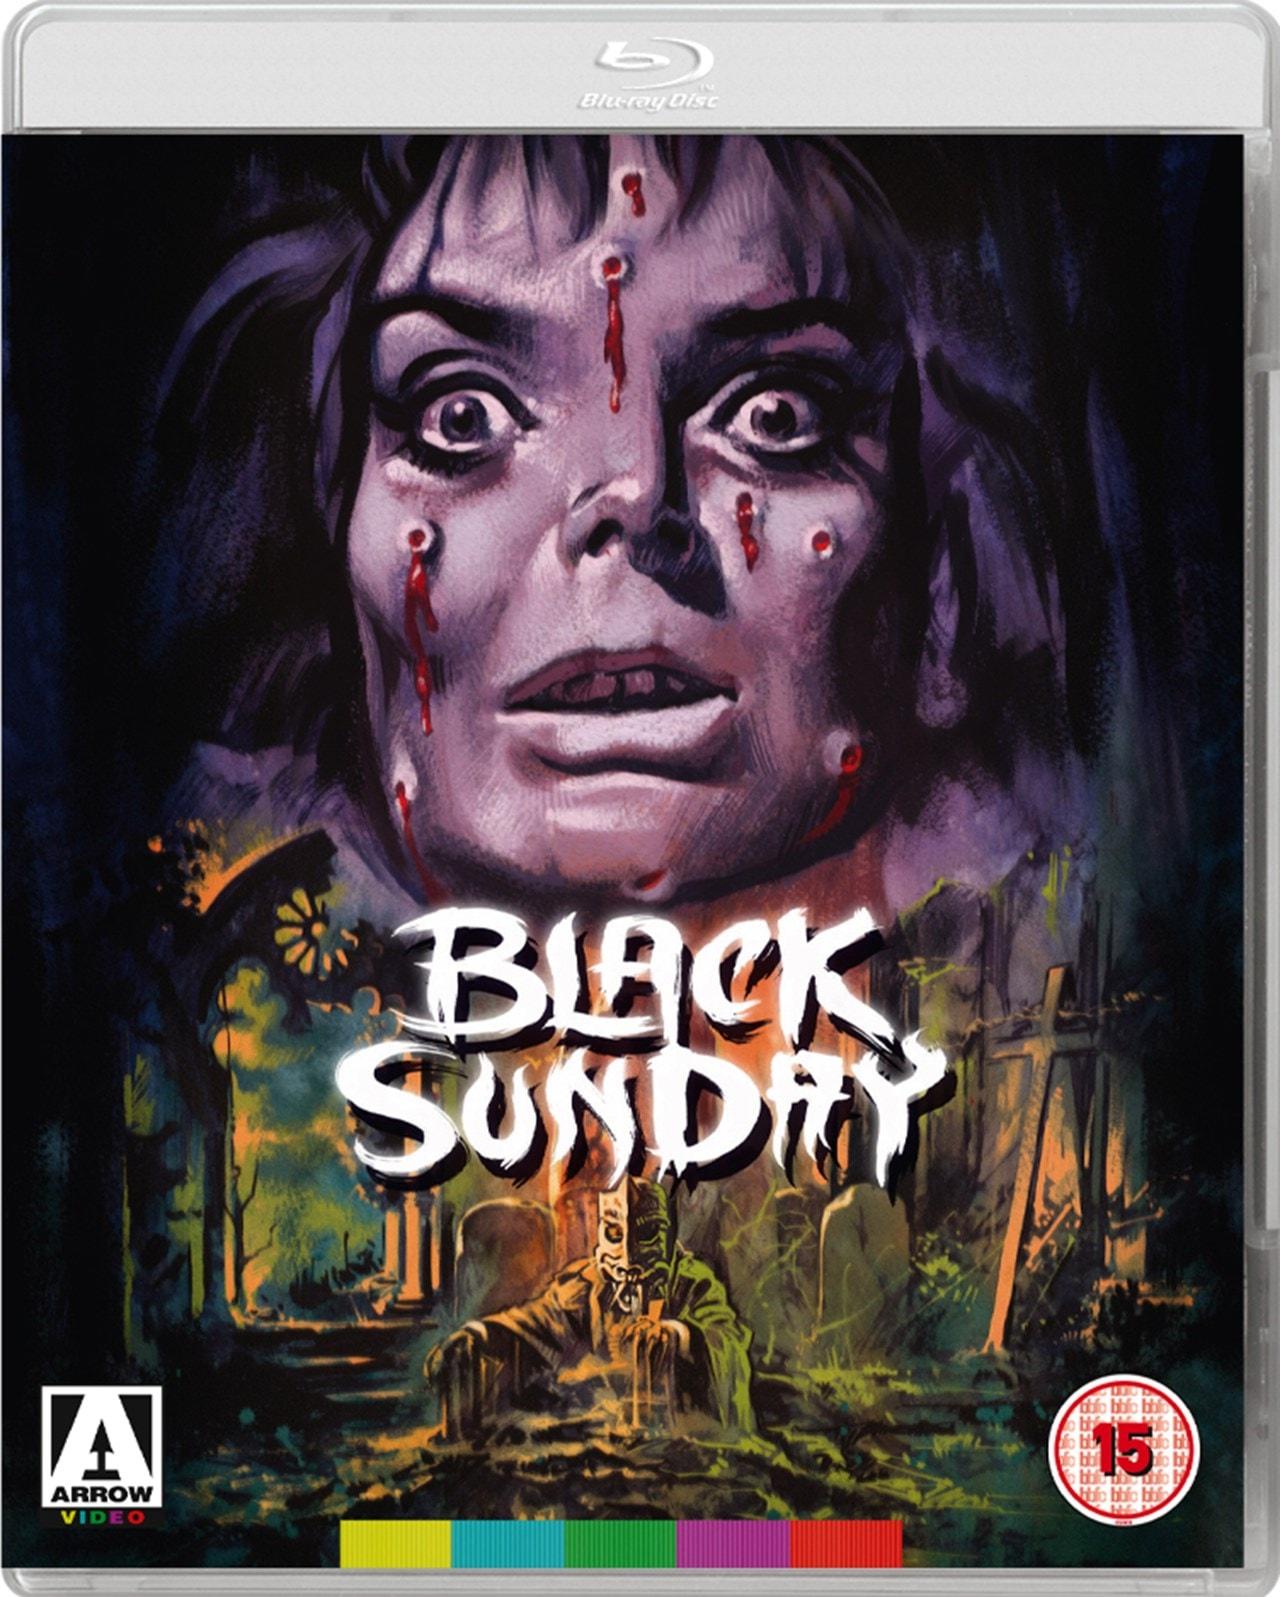 Black Sunday - 1